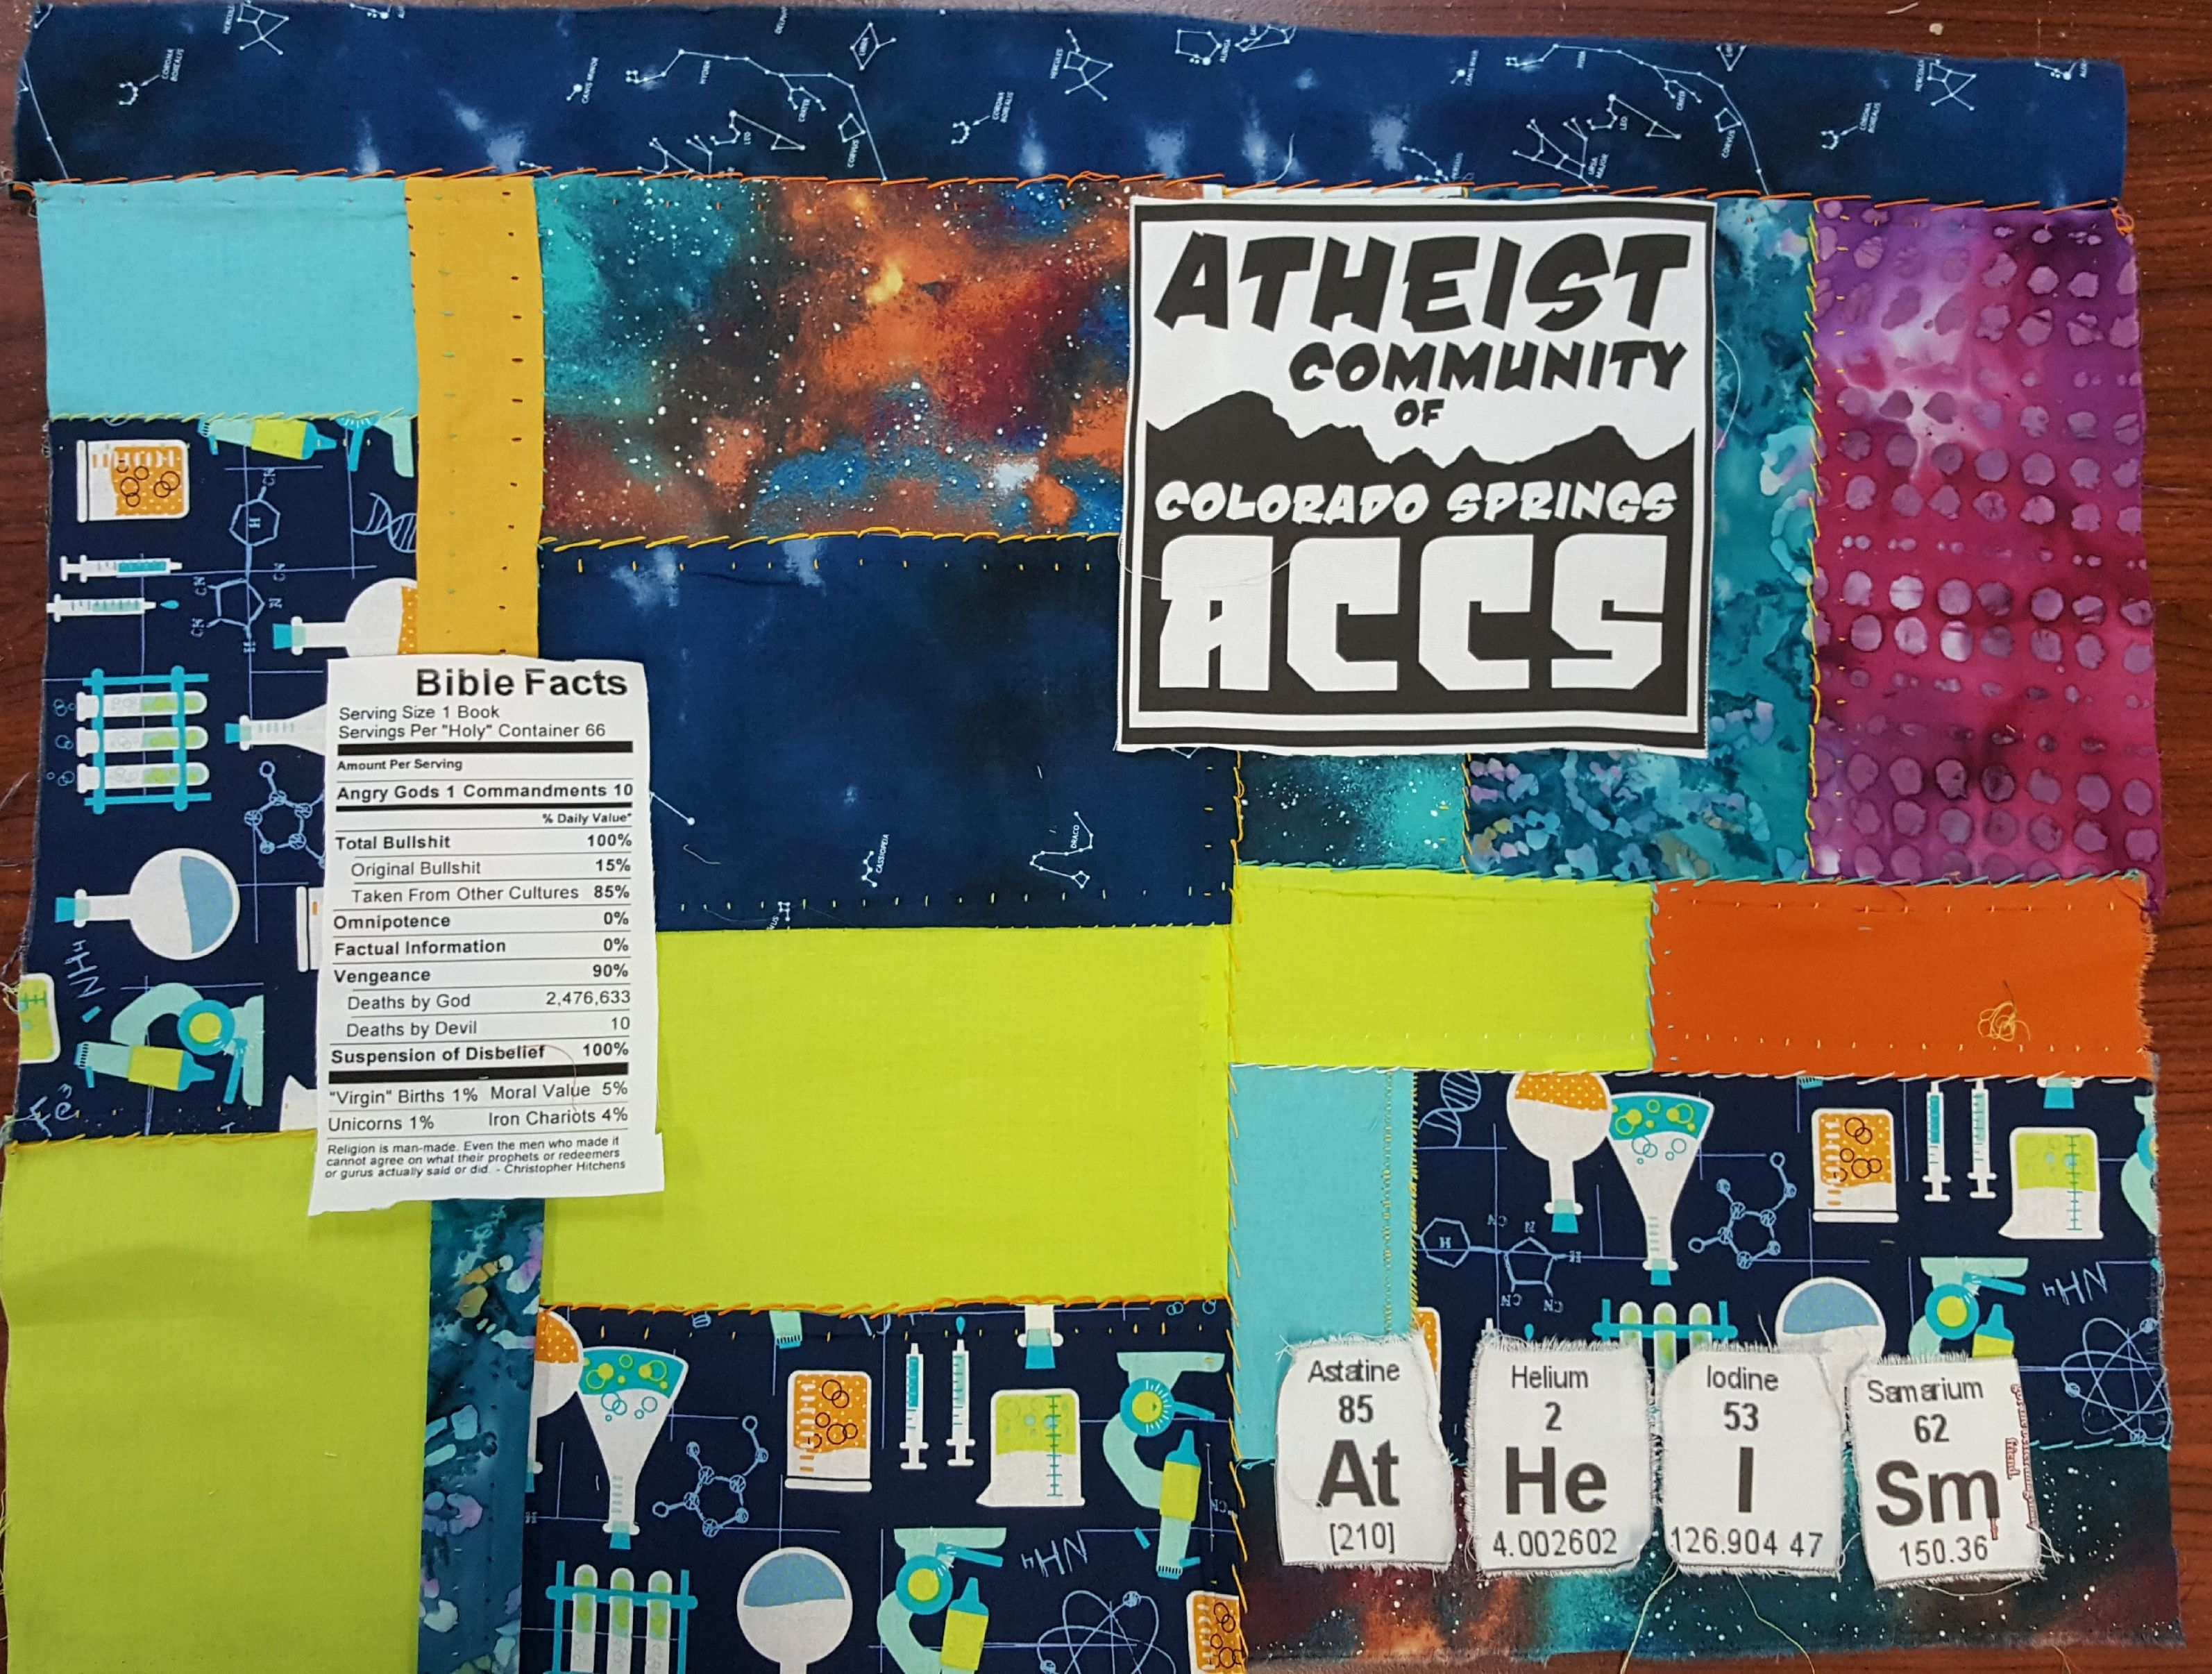 Atheist Community of Colorado Springs (ACCS)